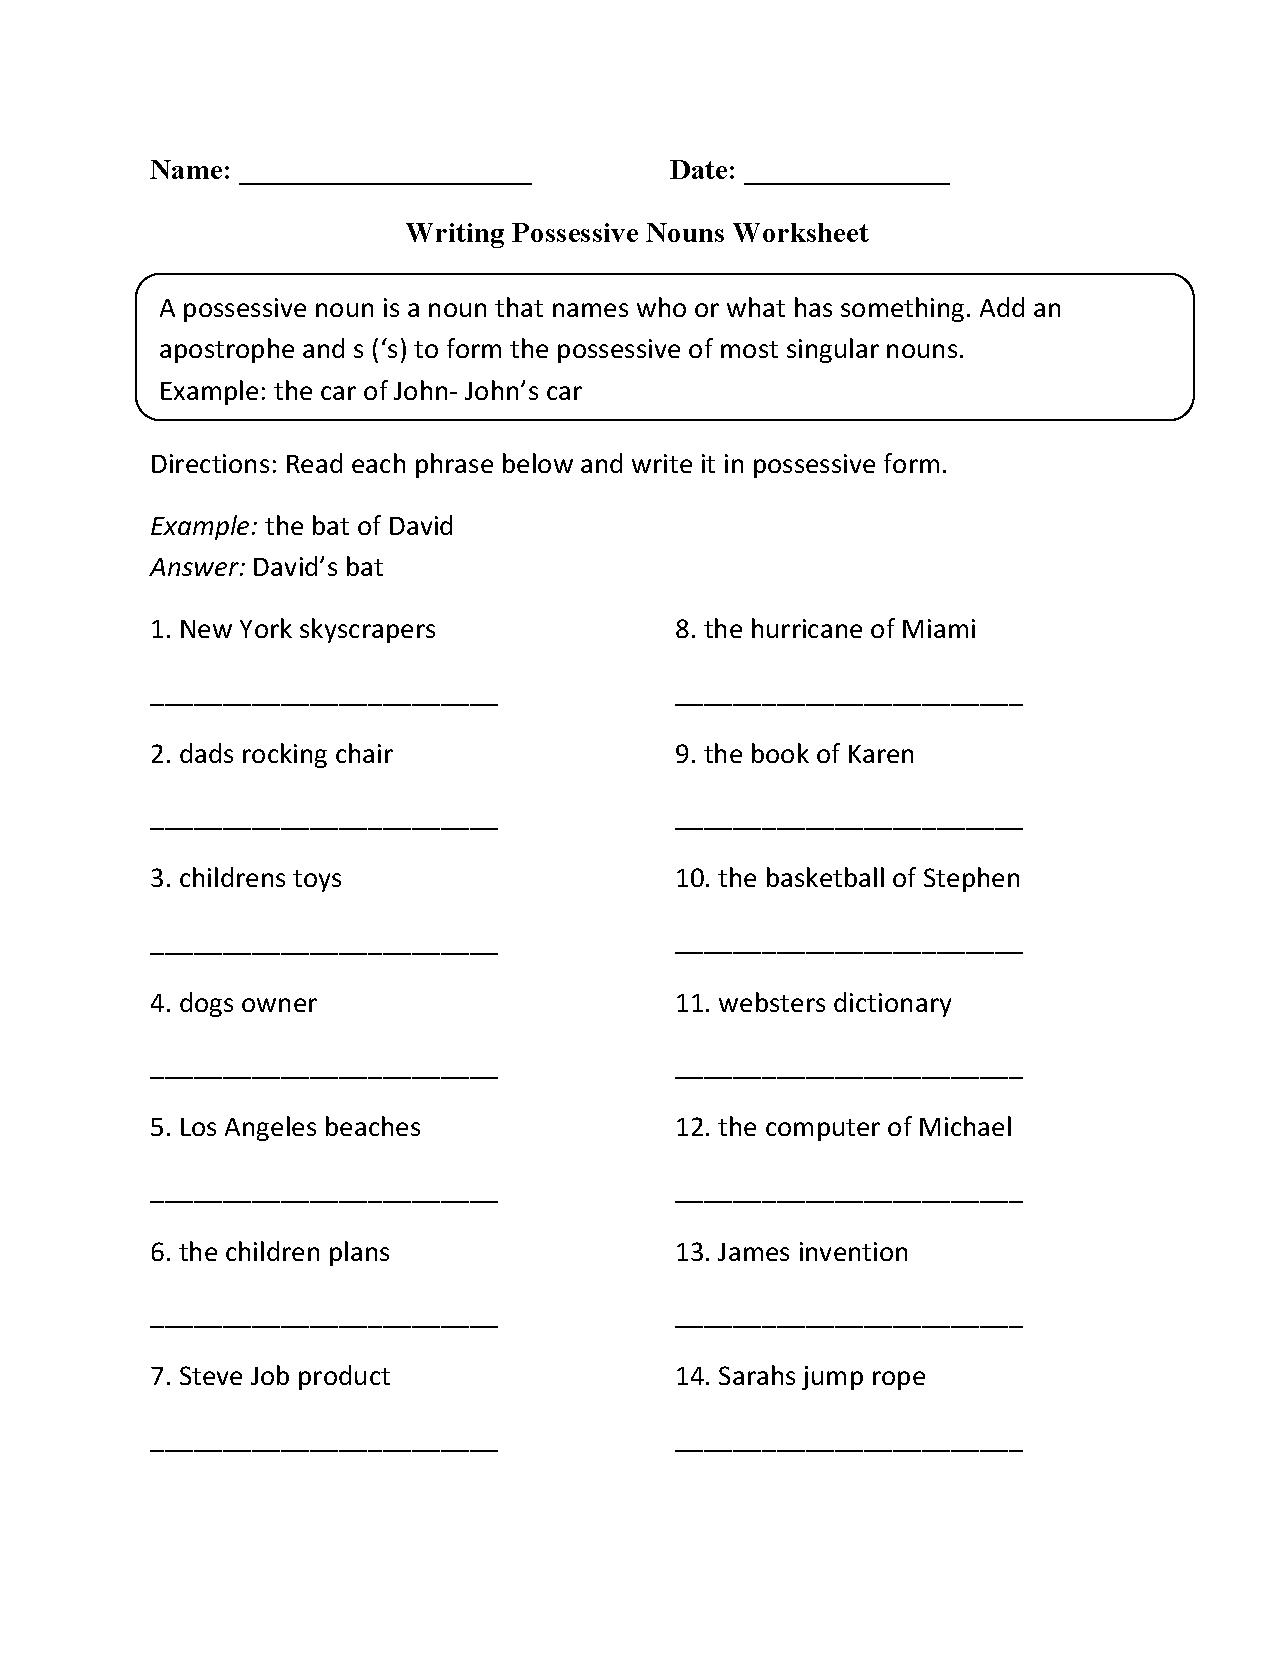 Spanish Possessive Pronoun Worksheets The Best Worksheets Image